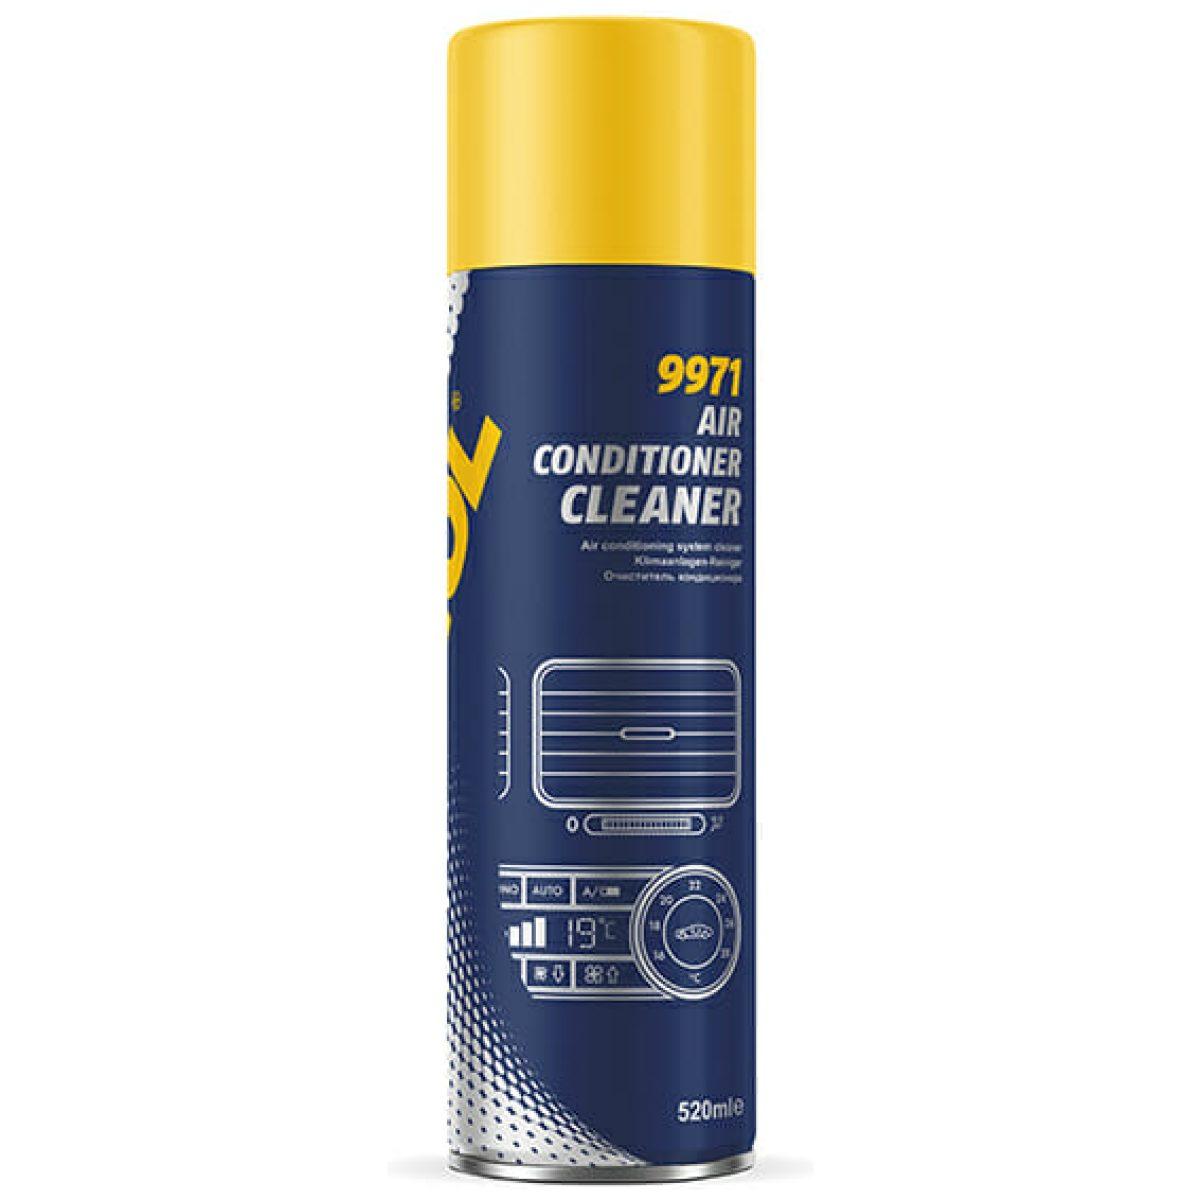 MANNOL Air Conditioner Cleaner 9971